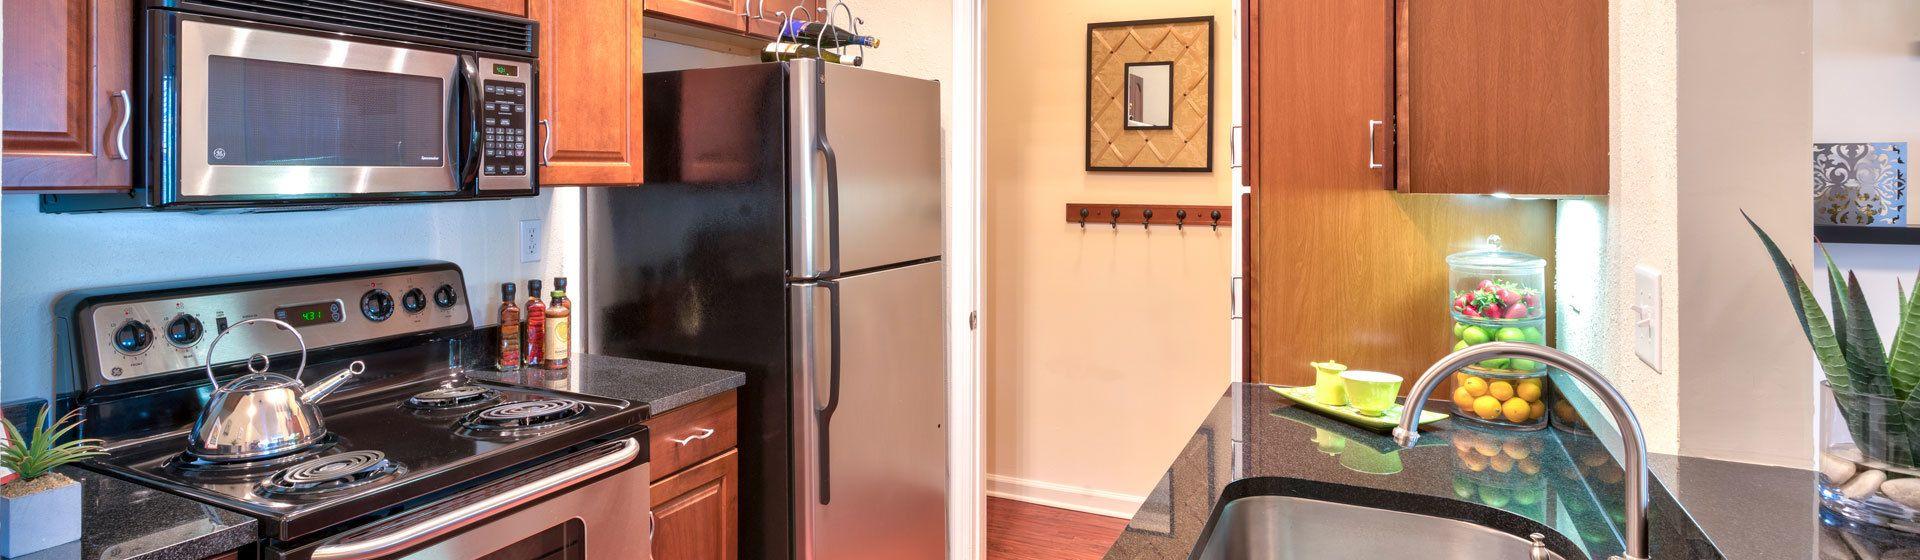 Apartments in Atlanta, Georgia